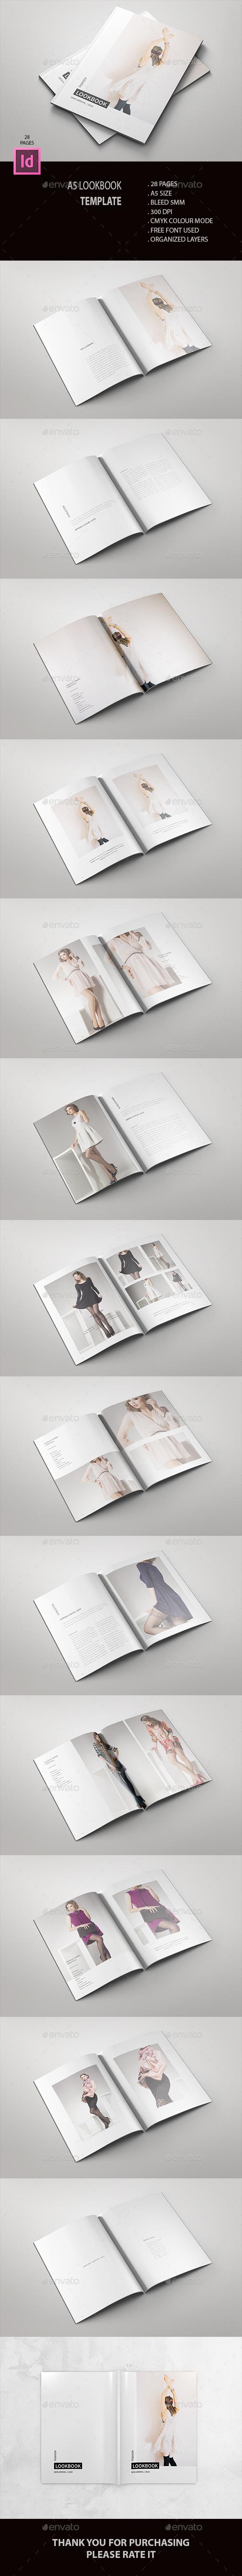 A5 Fashion Lookbook - Brochures Print Templates